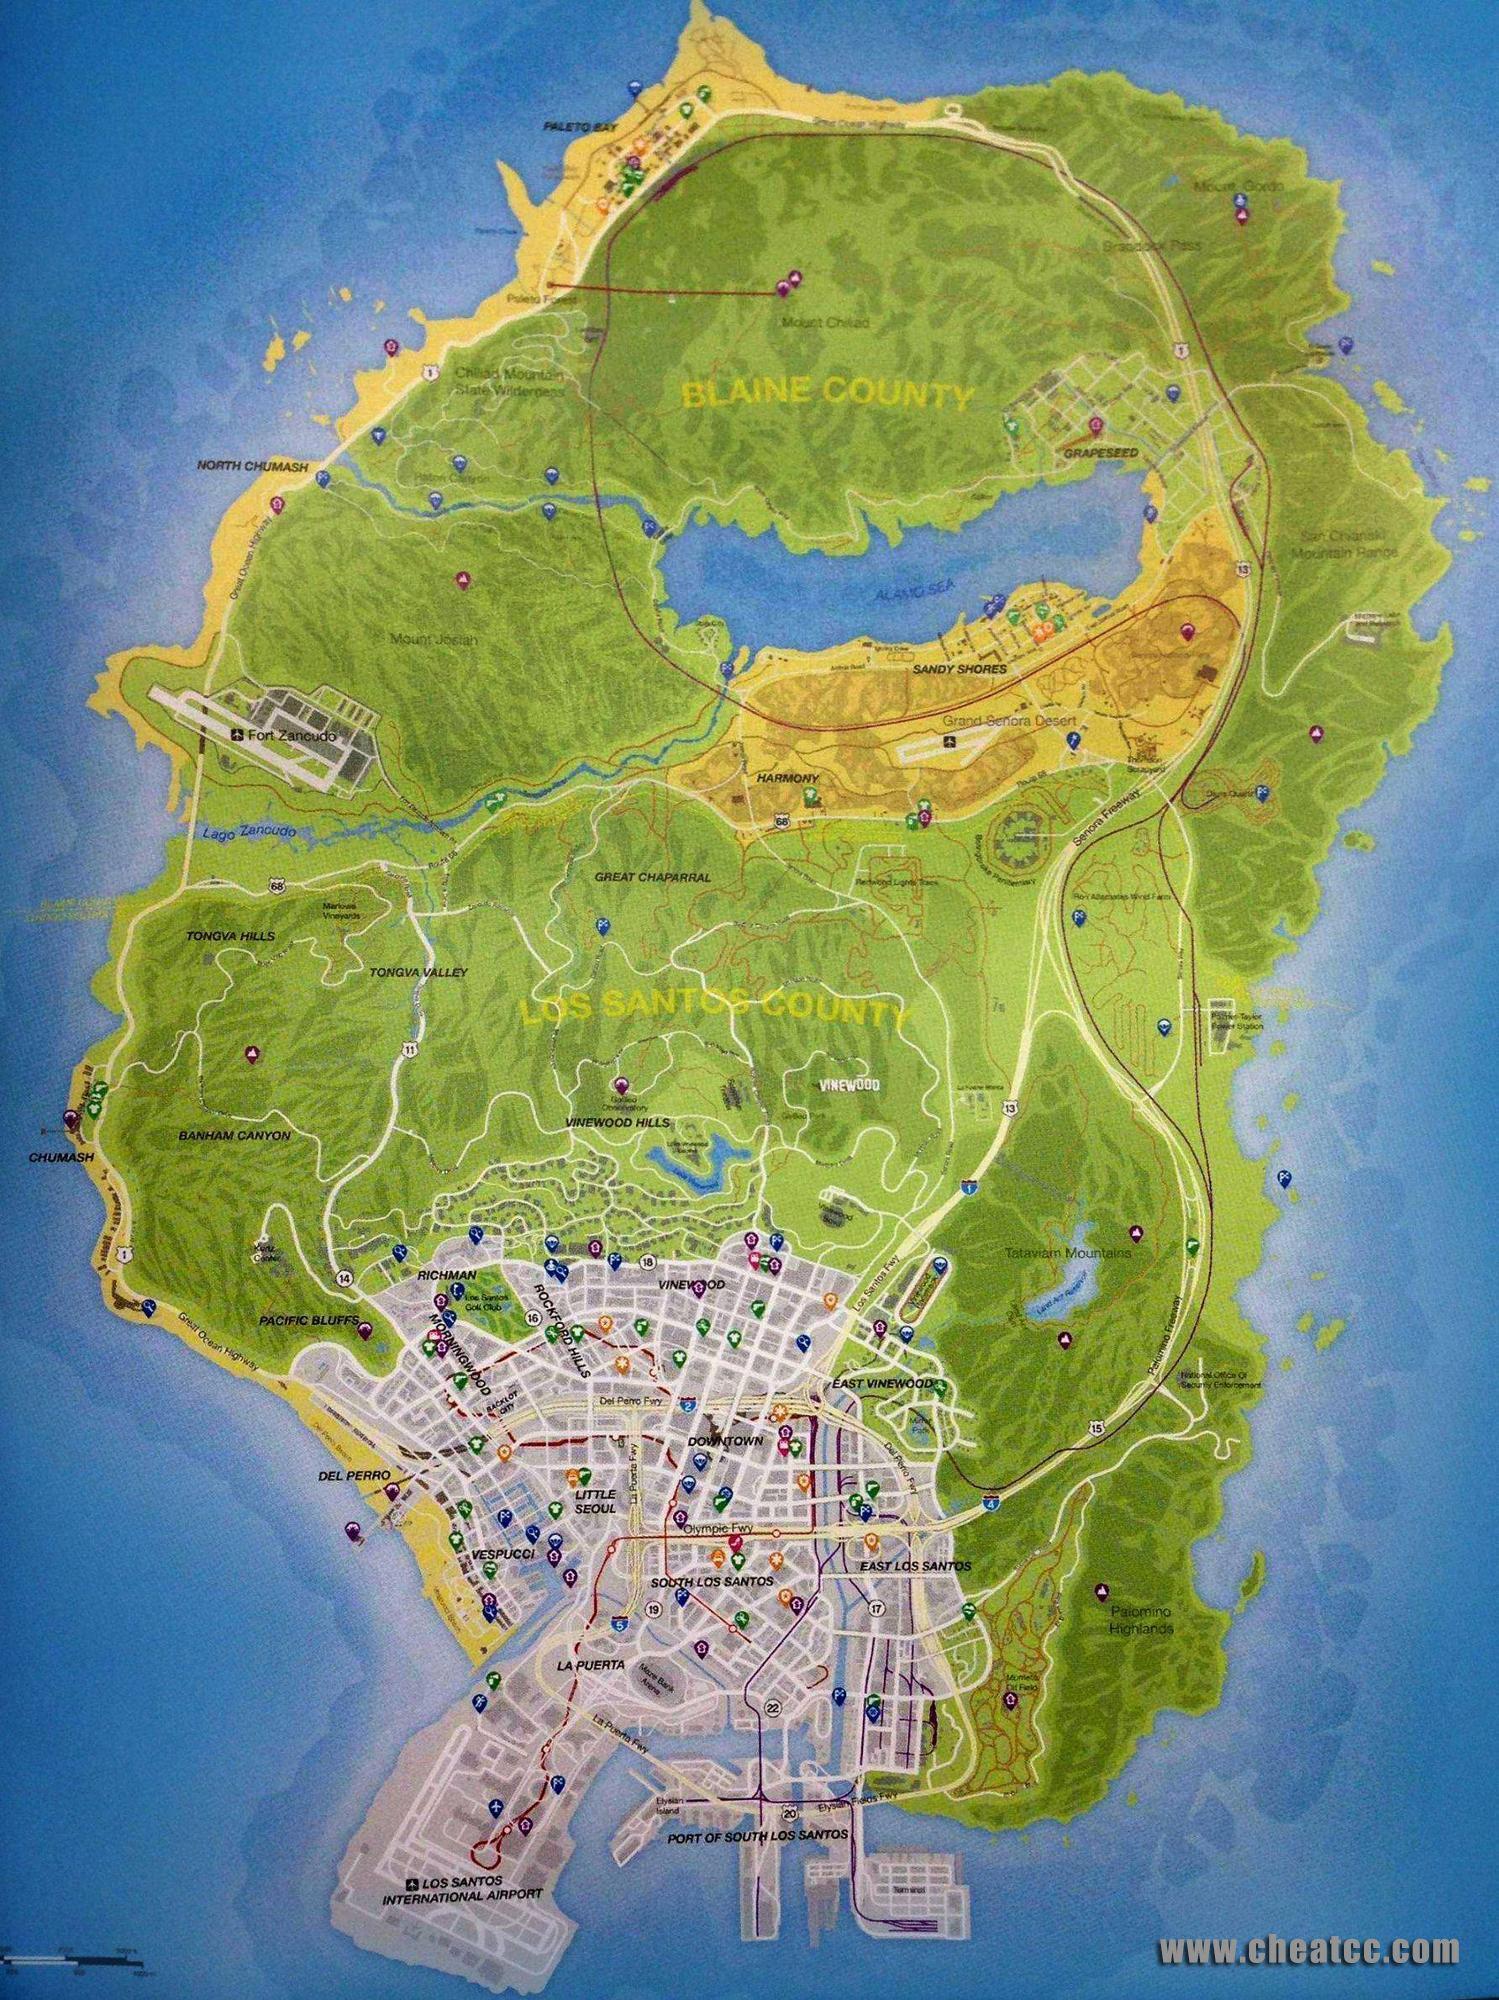 Gta 5 Full Map Jpg 1499 2000 Grand Theft Auto Gta Gta V Cheats